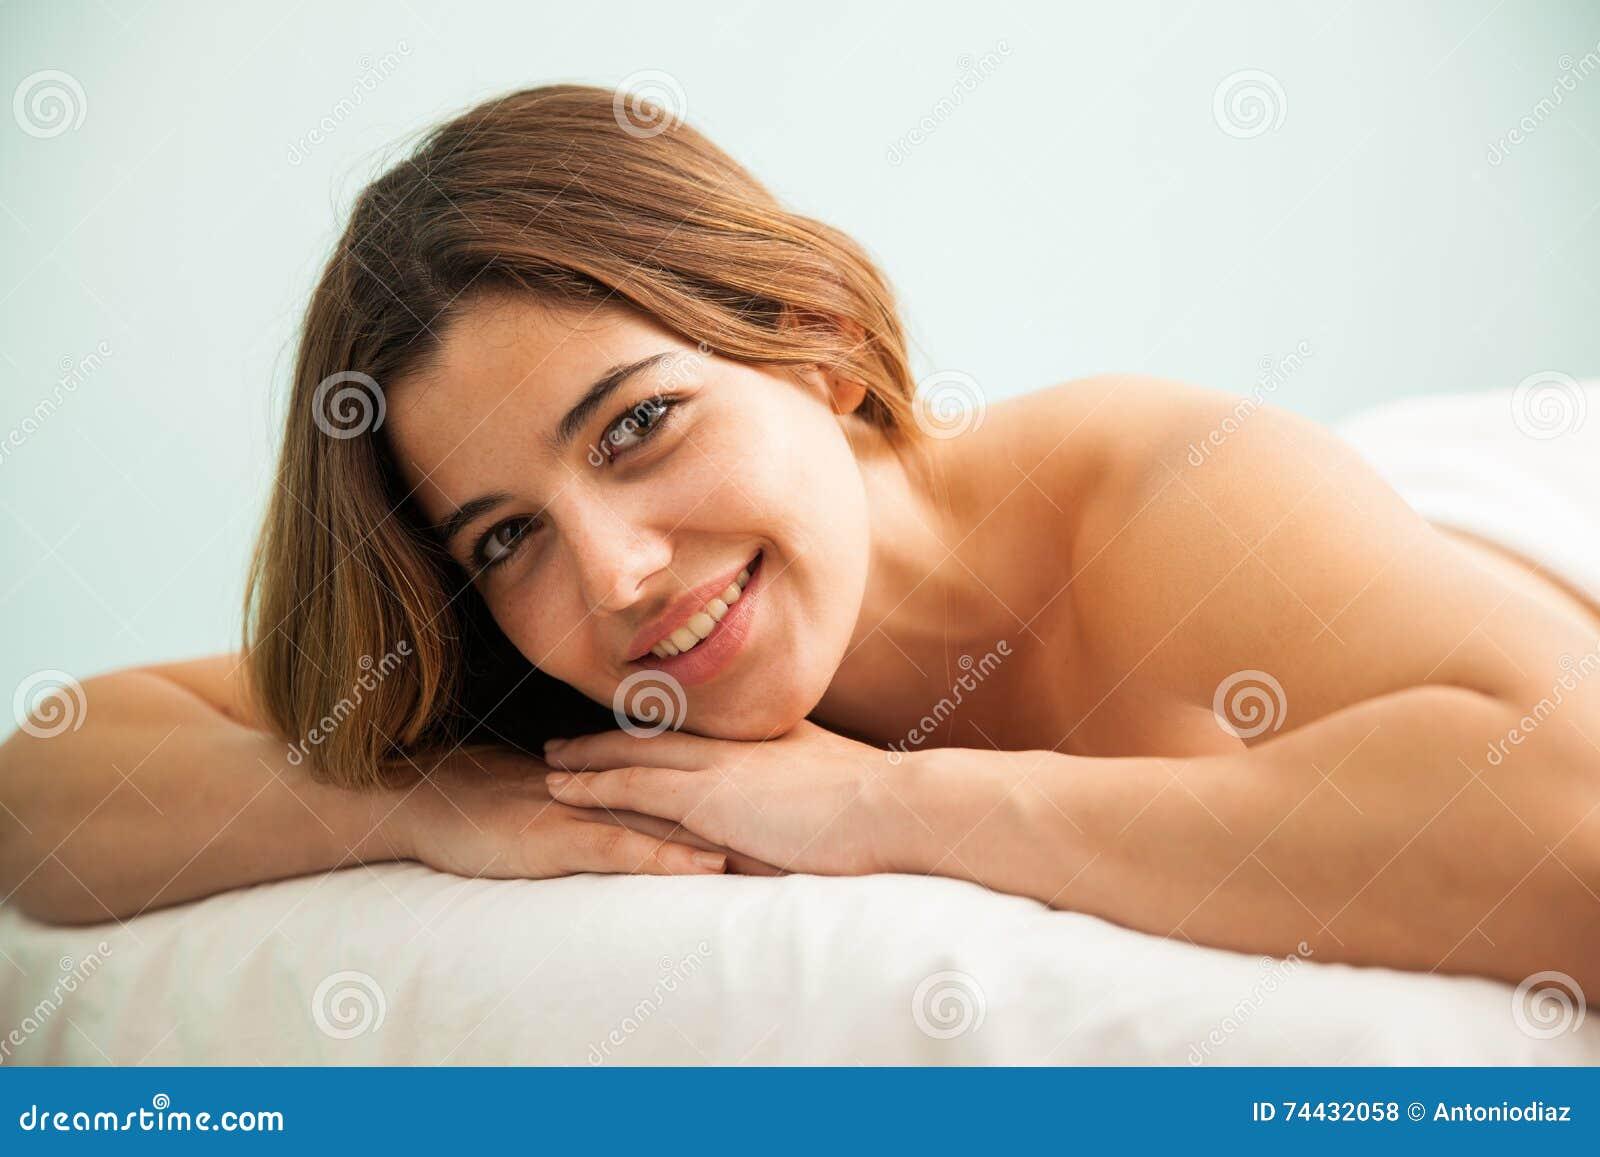 Adult porn asian